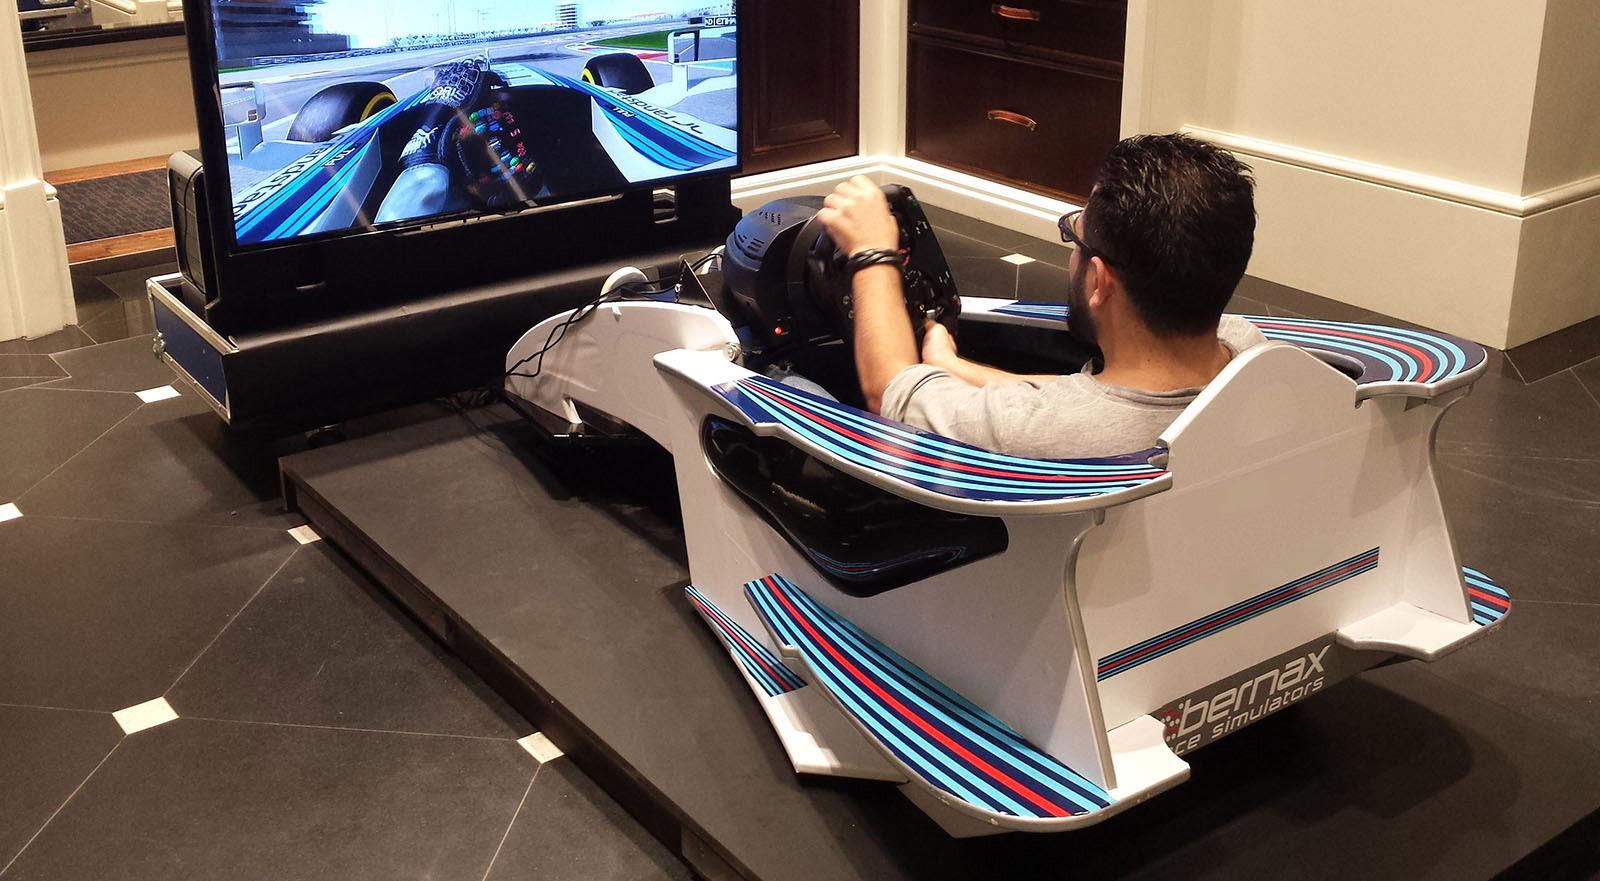 racing simulator chair plans diy rail buy a race bernax simulators